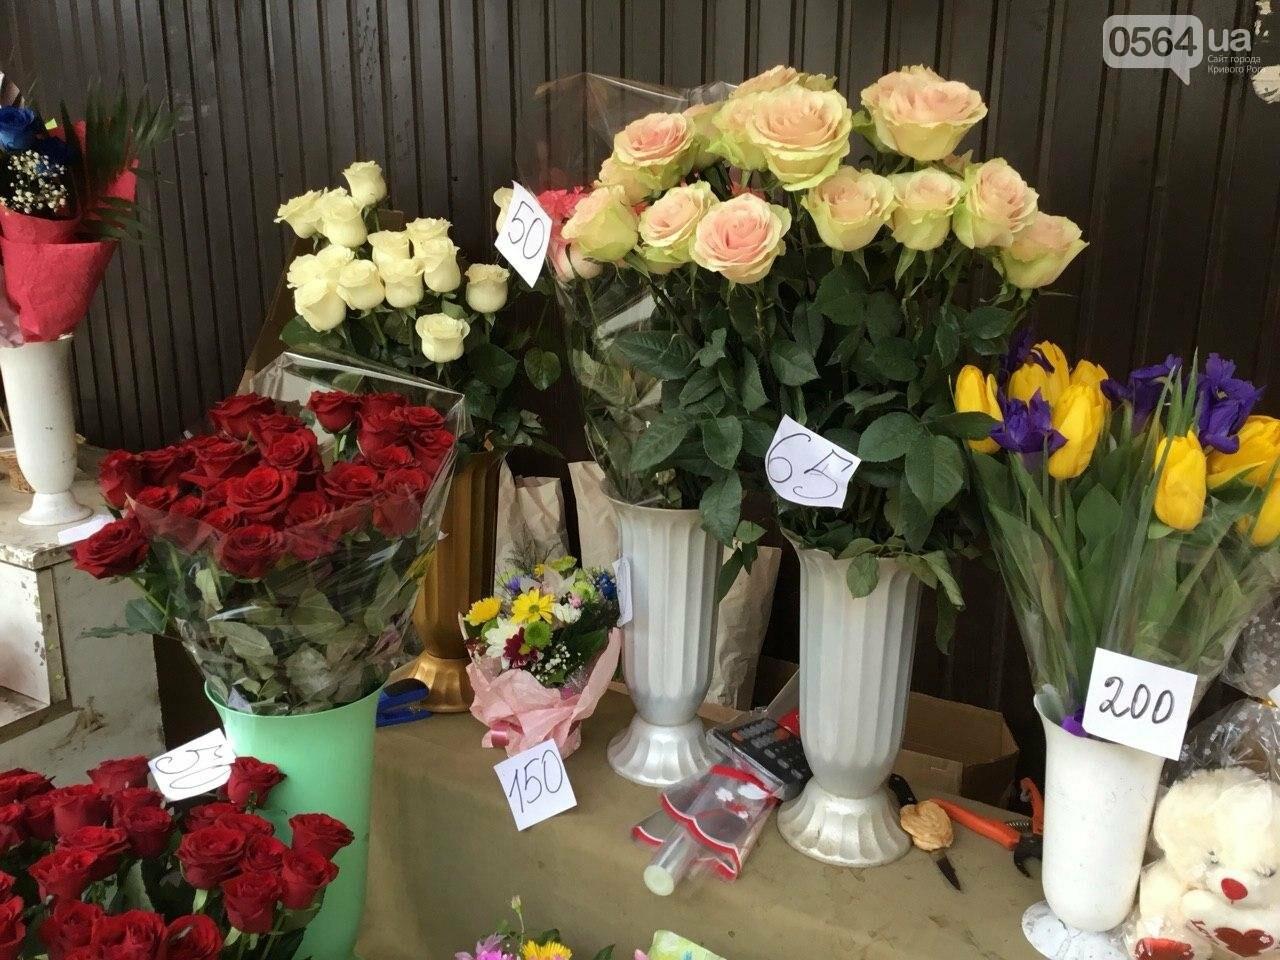 Сколько стоят примула, цикламен, мимоза? Обзор цен на цветы в Кривом Роге, - ФОТО, ВИДЕО, фото-16